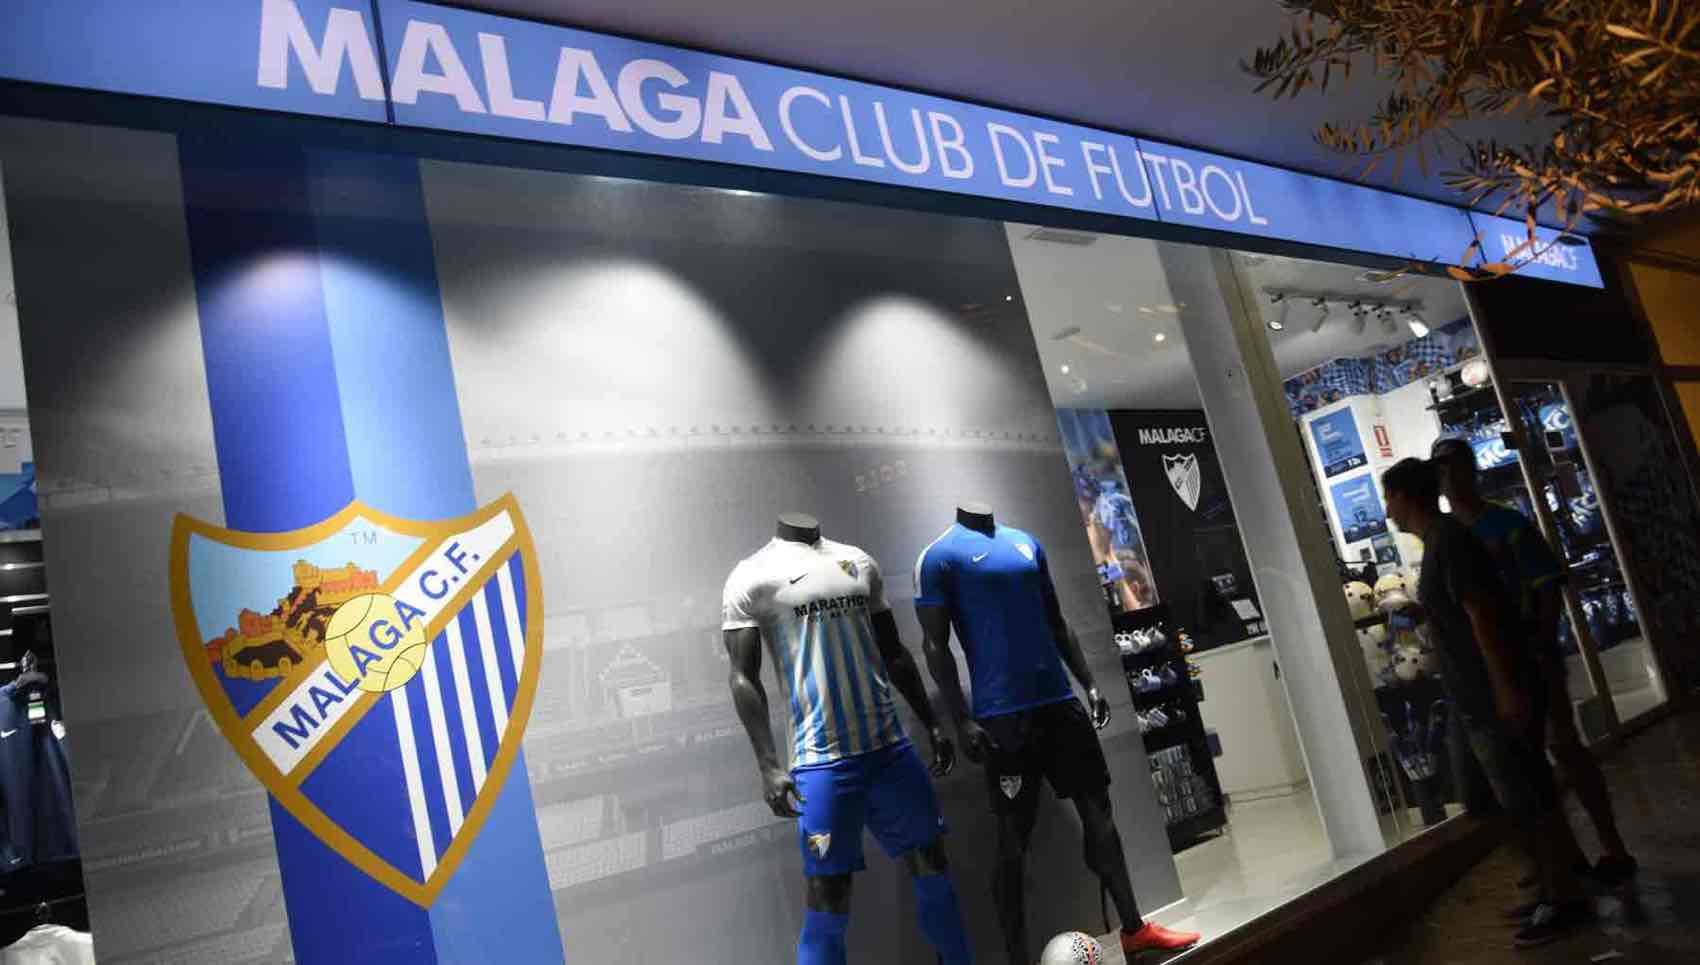 Local heroes: Hopefully Malaga FC soon will return to La Liga in Spain